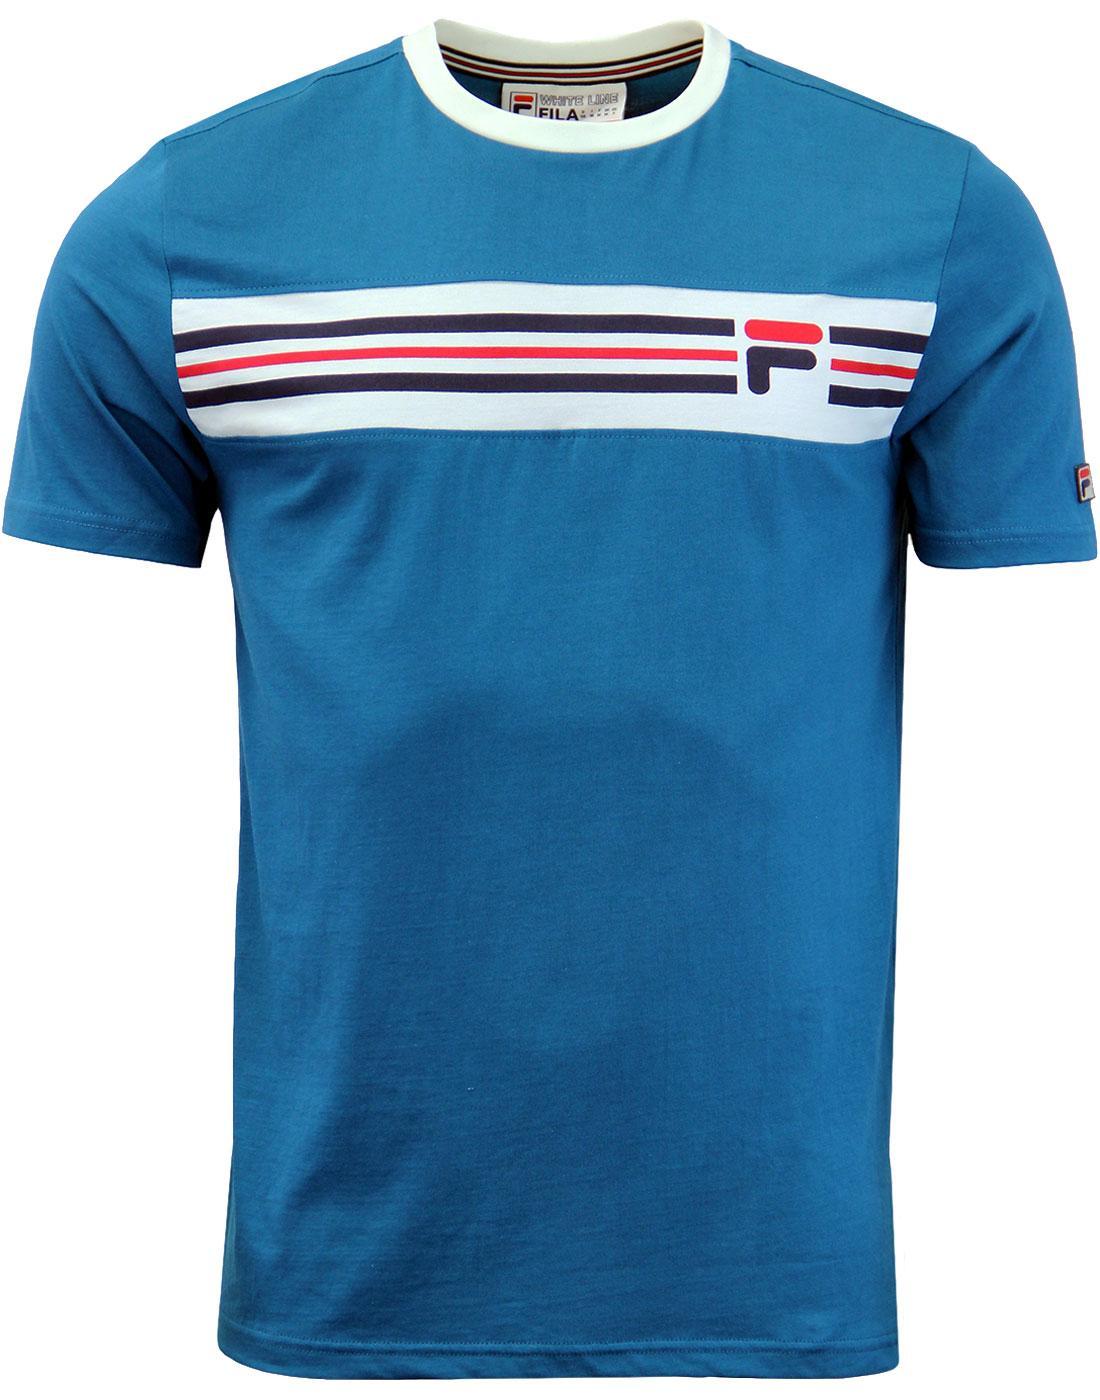 9a1e0b1f9ffe2 FILA VINTAGE Vandorno Retro Indie Ringer T-Shirt in Lyons Blue.